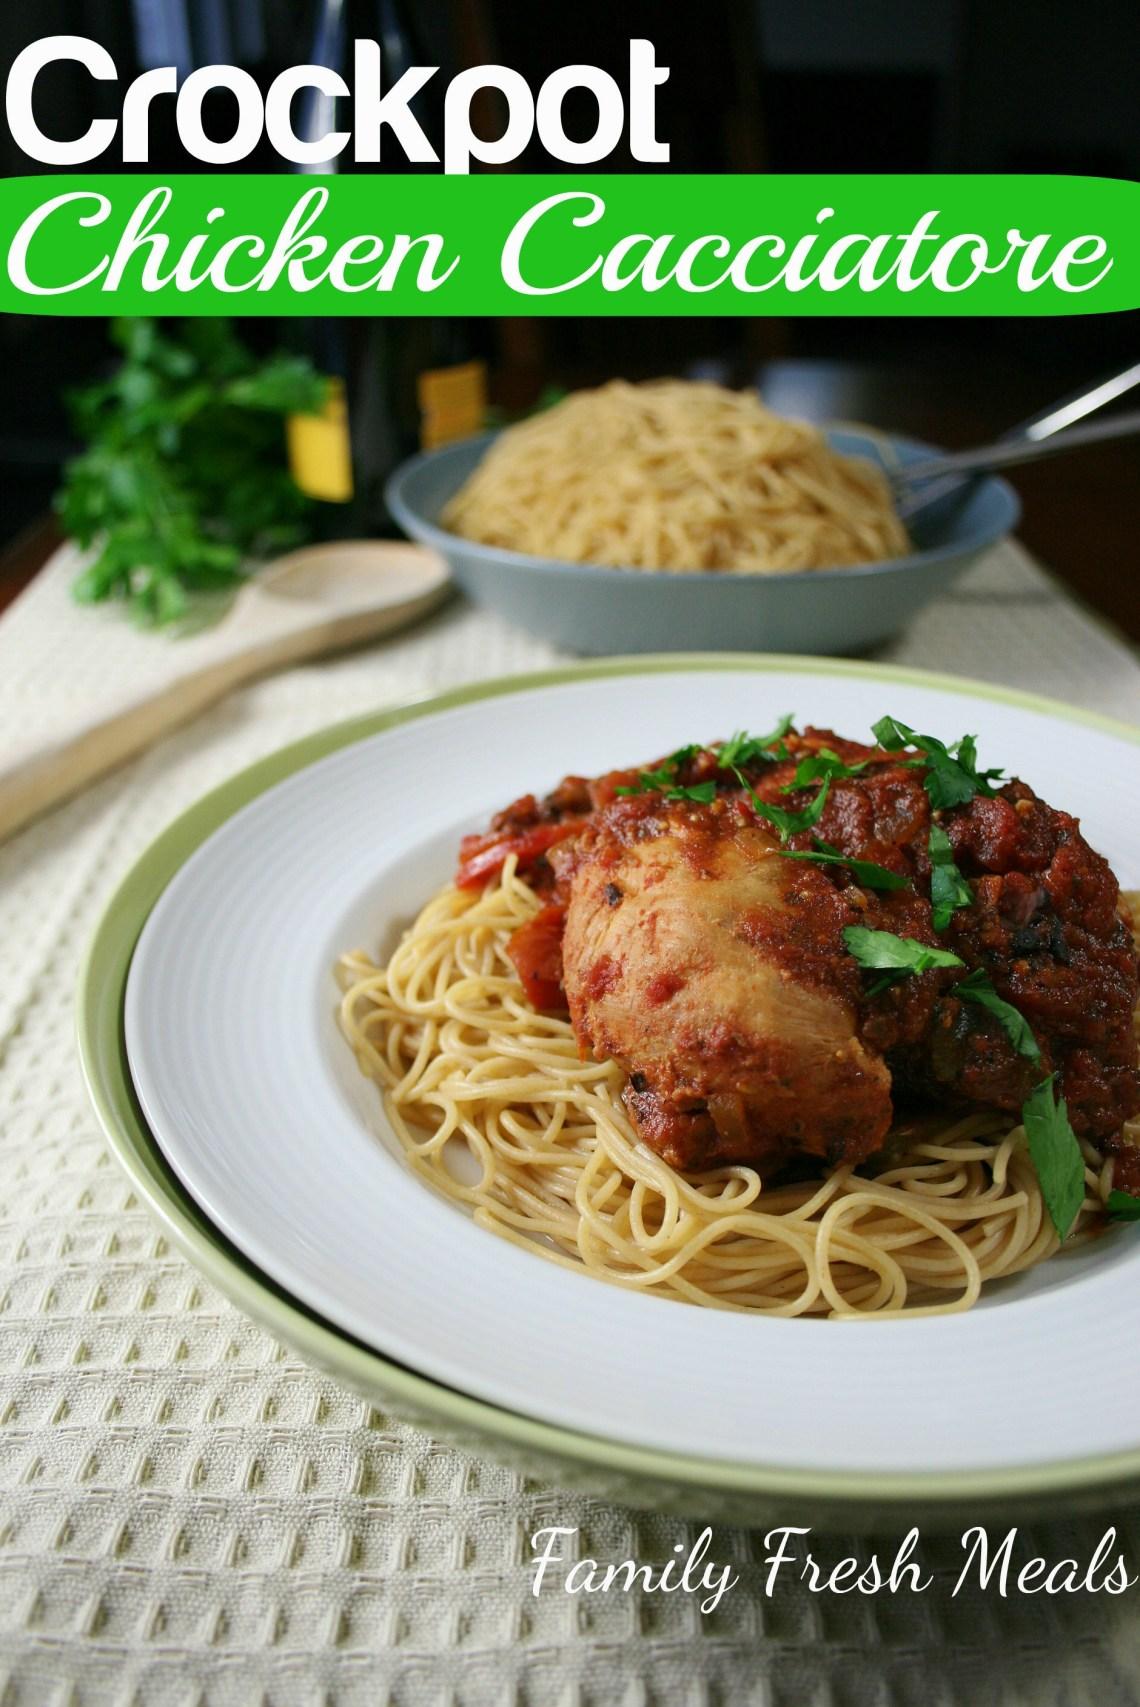 Crockpot Chicken Cacciatore - Family Fresh Meals